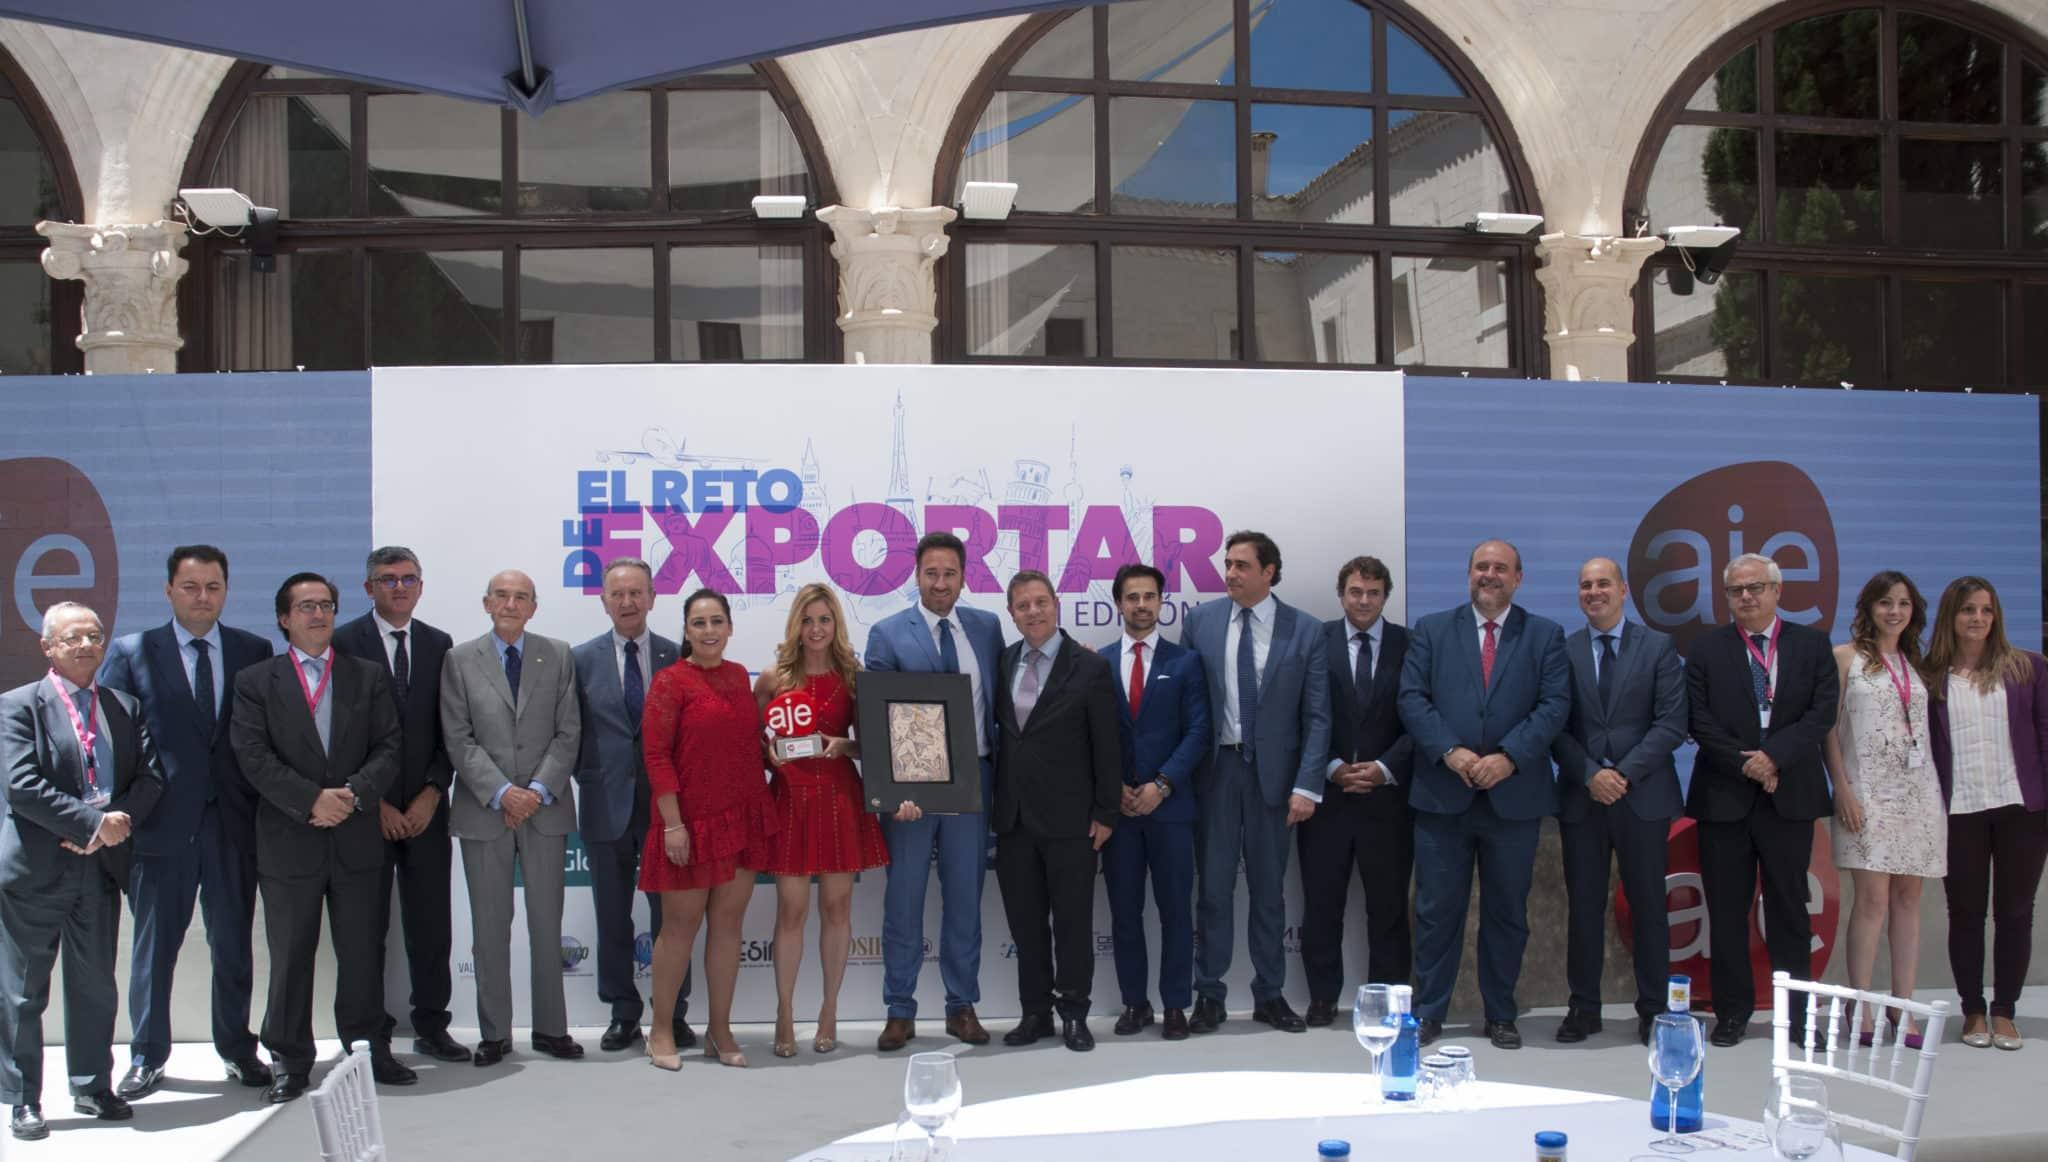 https://blog.globalcaja.es/wp-content/uploads/2018/06/AJE-Foto-familia.jpg